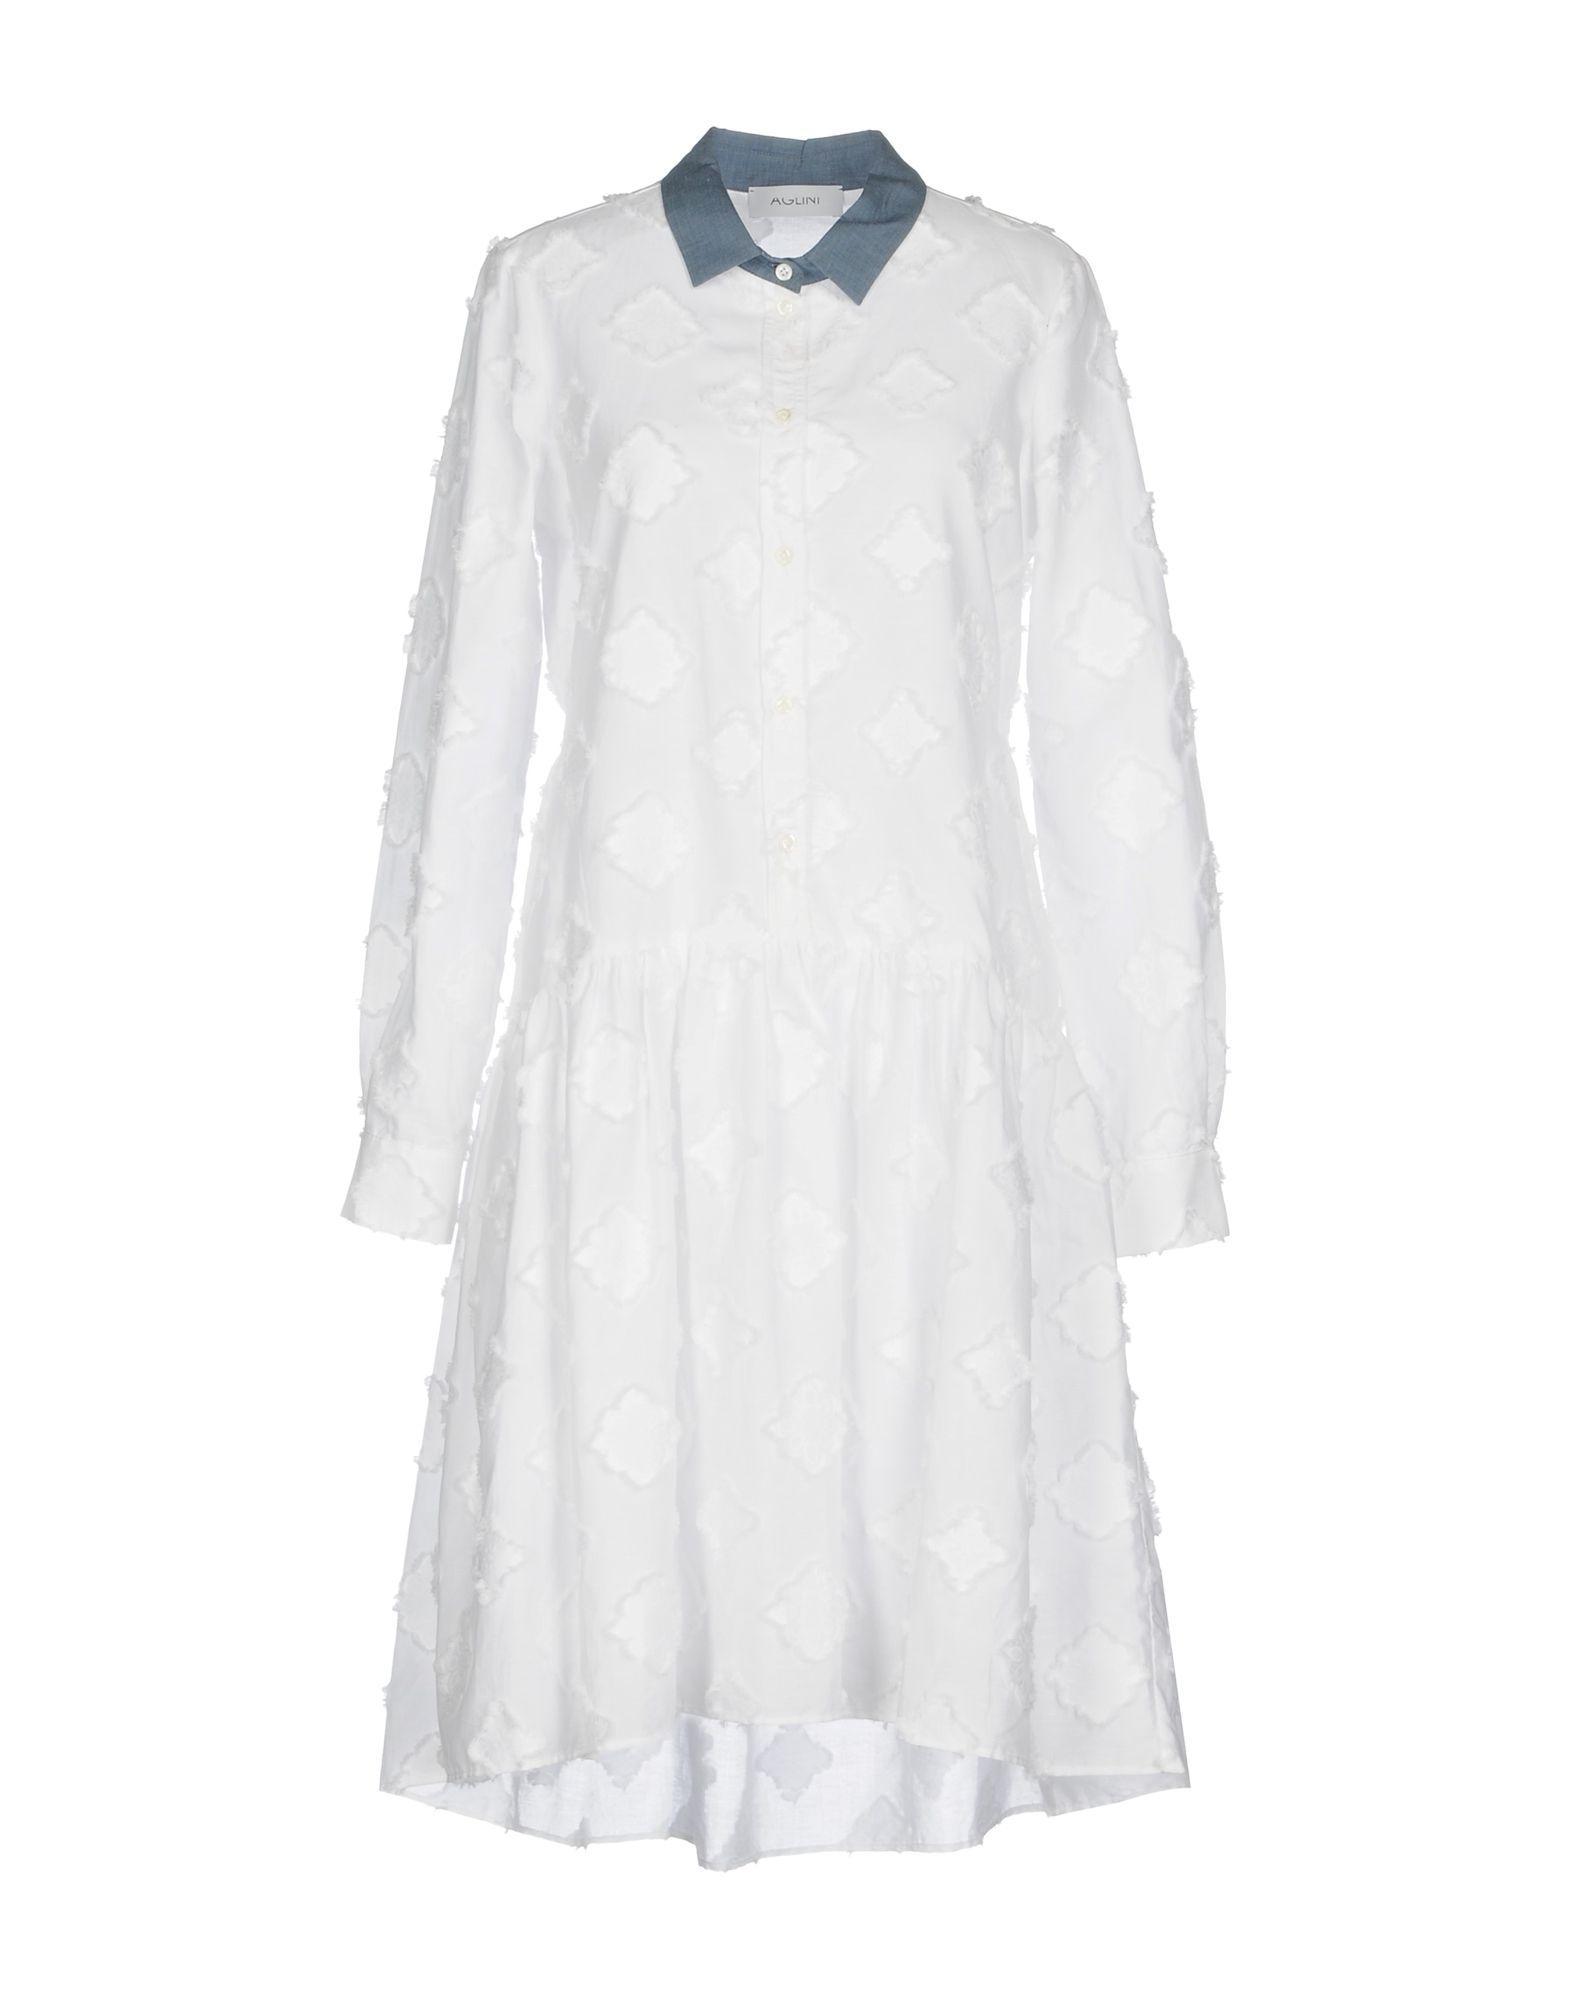 Aglini Knee-Length Dress In White